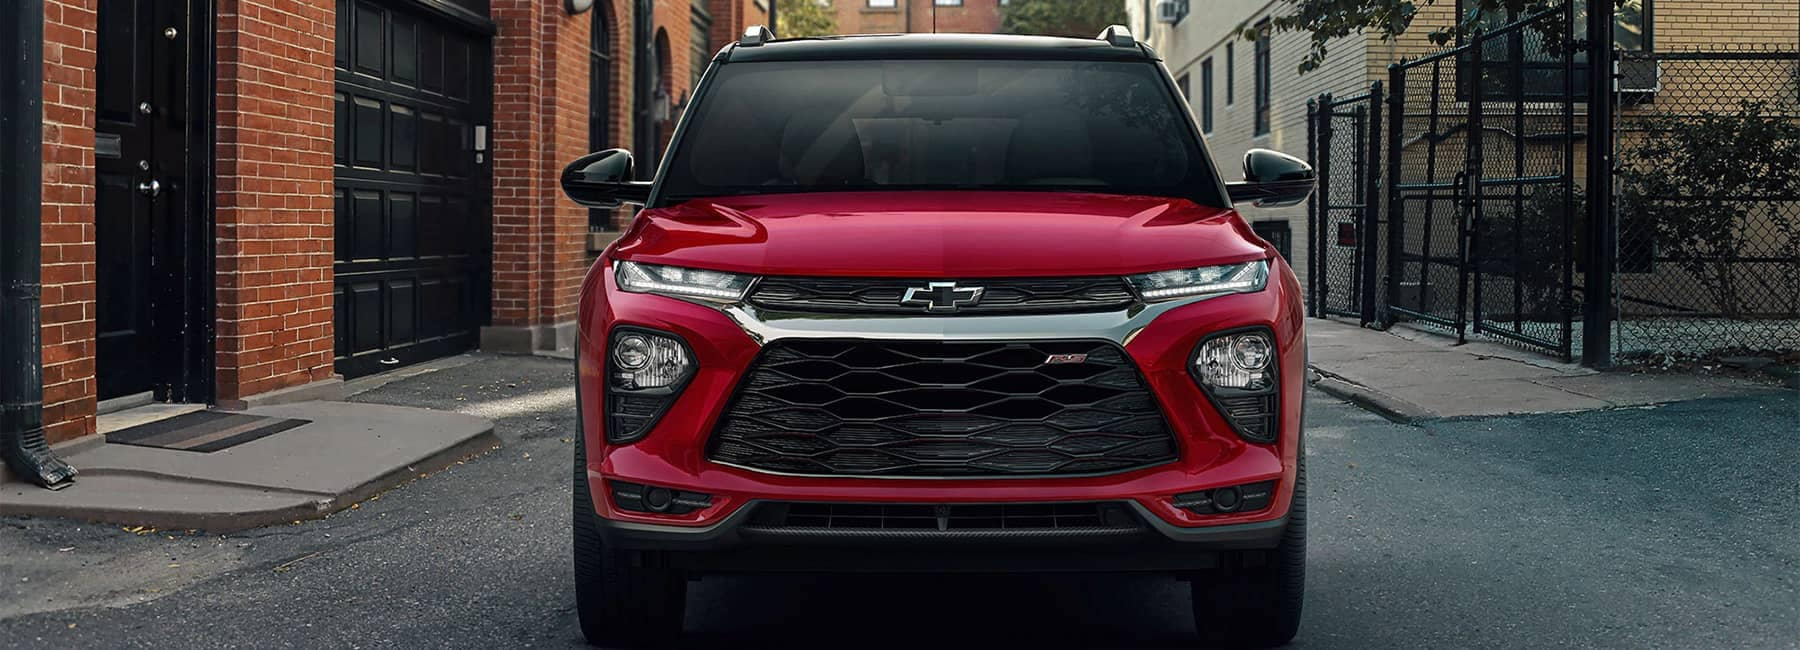 2021 Chevy Trailblazer Parked Front View